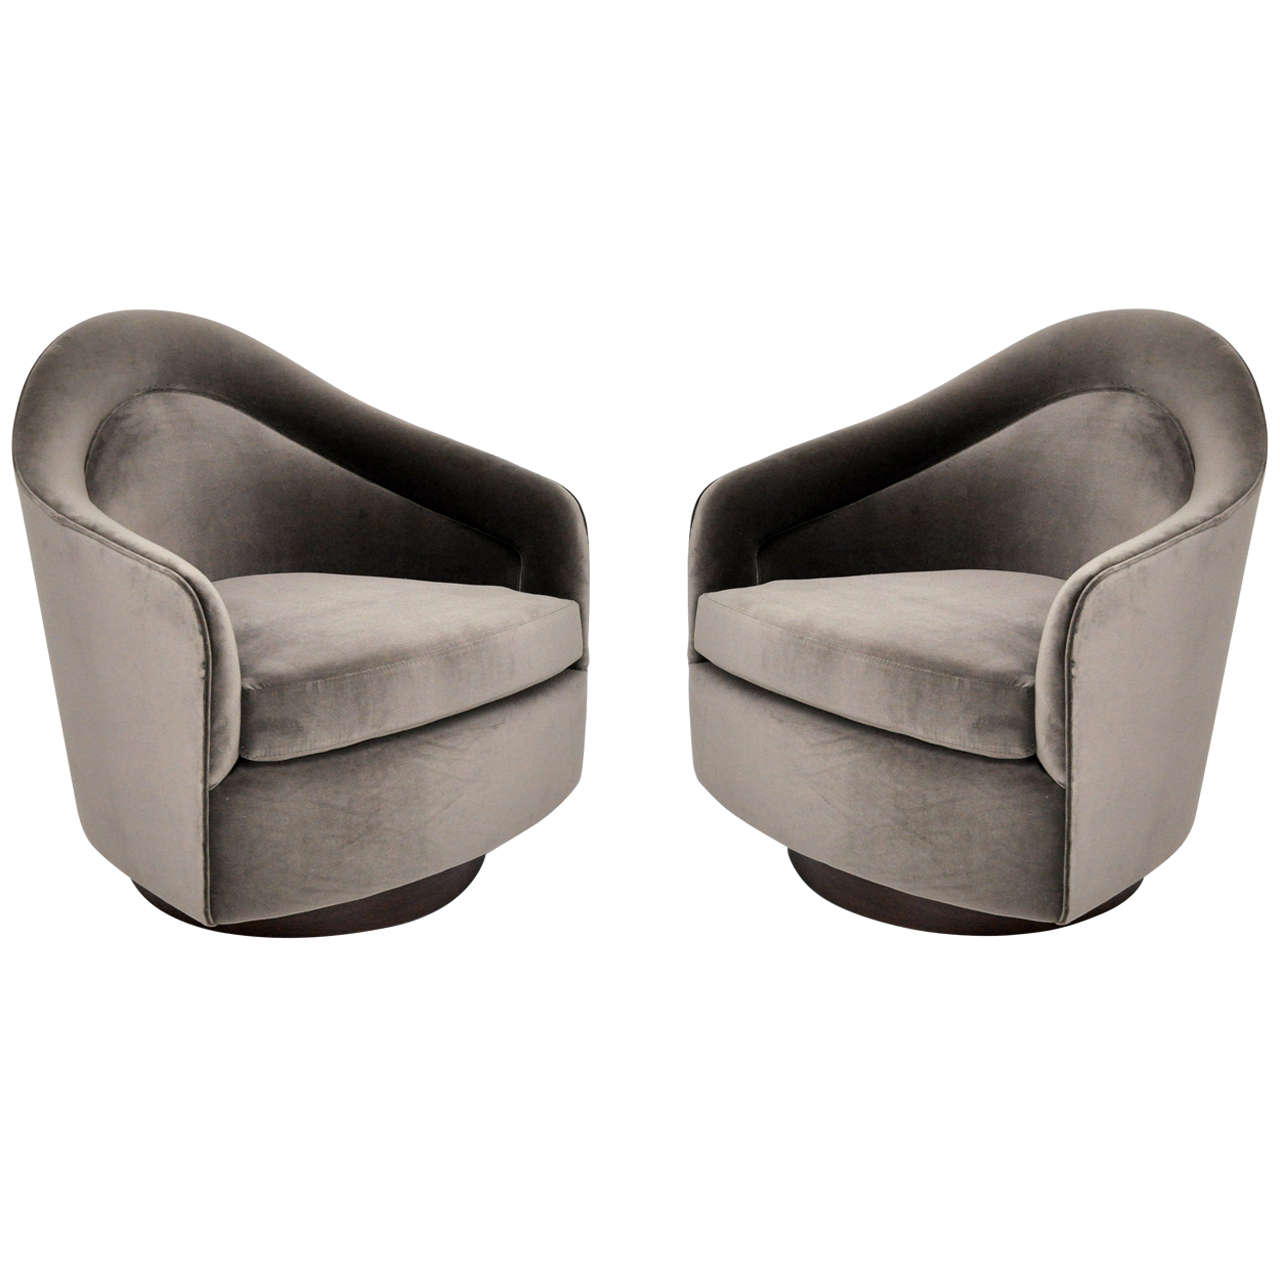 swivel lounge chairs egg shaped chair x jpg